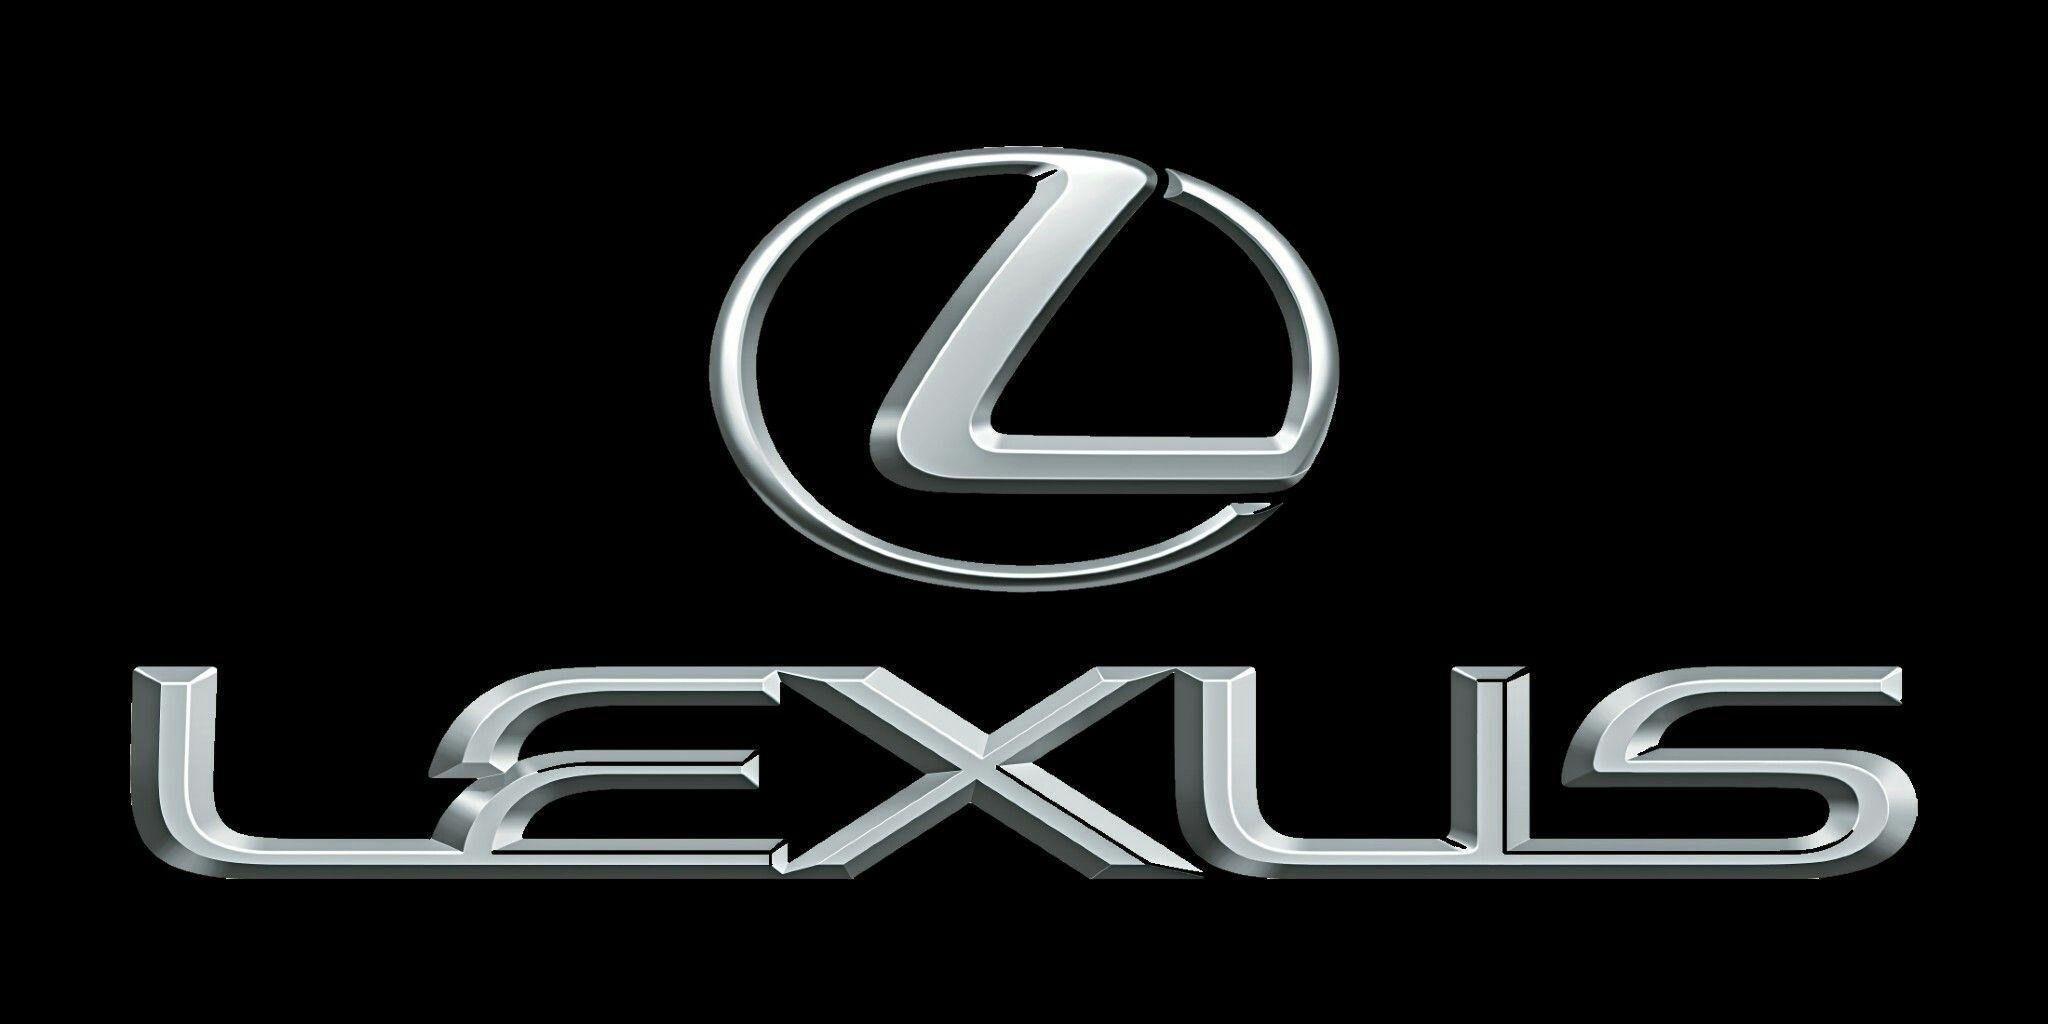 Lexus Logo Wallpapers - Wallpaper Cave